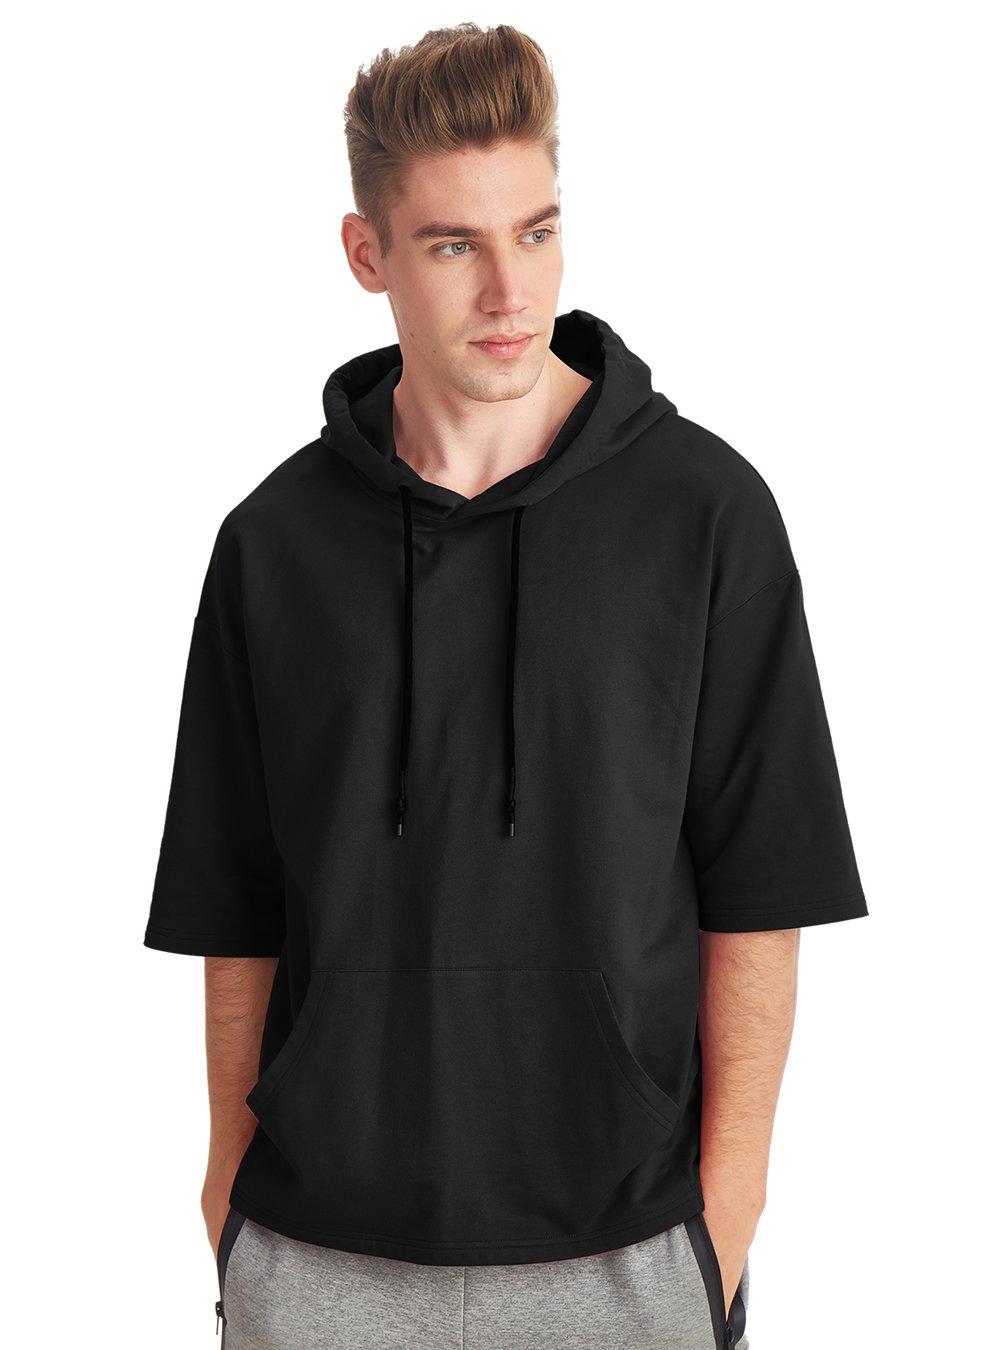 Zengjo Men's Short Sleeve Active Sportwear Hip Hop Sweatshirt Solid Fashion Hoodie T-Shirt (XXL, Black)